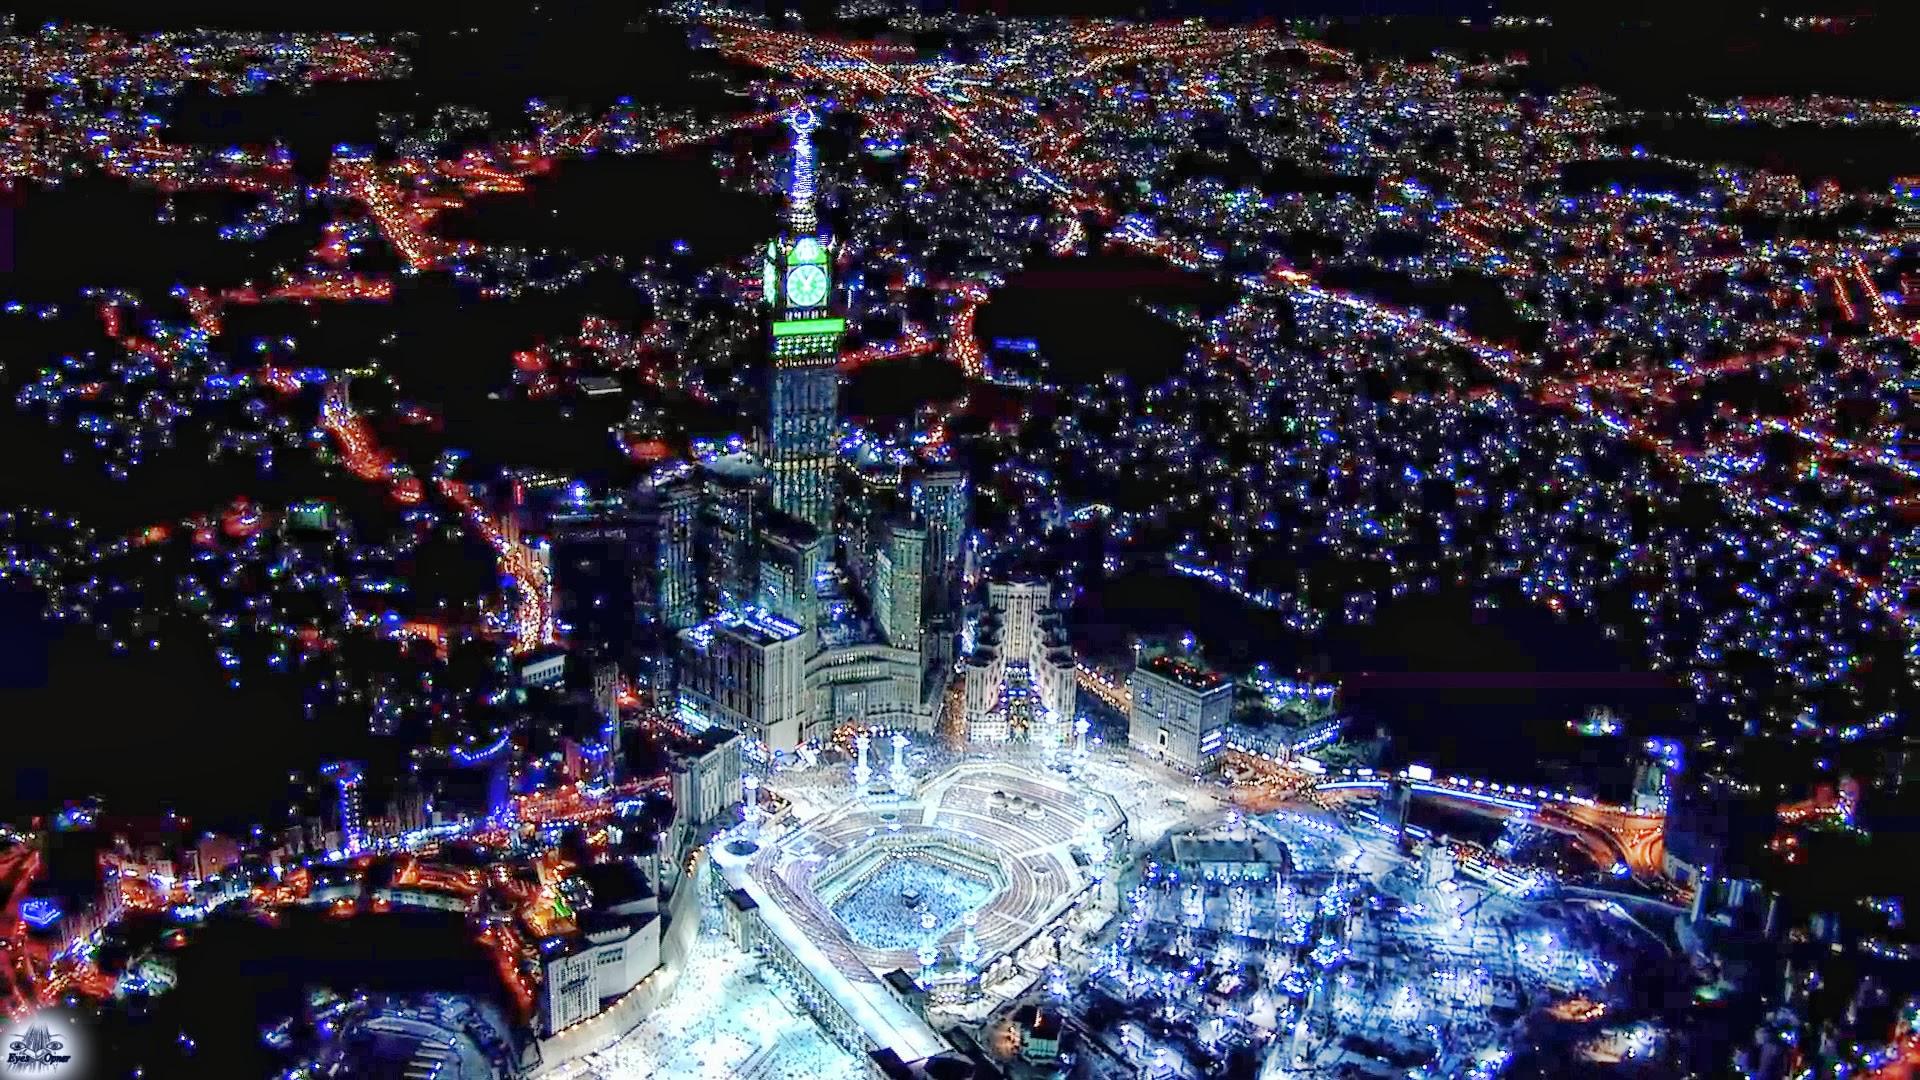 Mecca At Night Desktop Backgrounds for HD Wallpaper wall  art 1920x1080